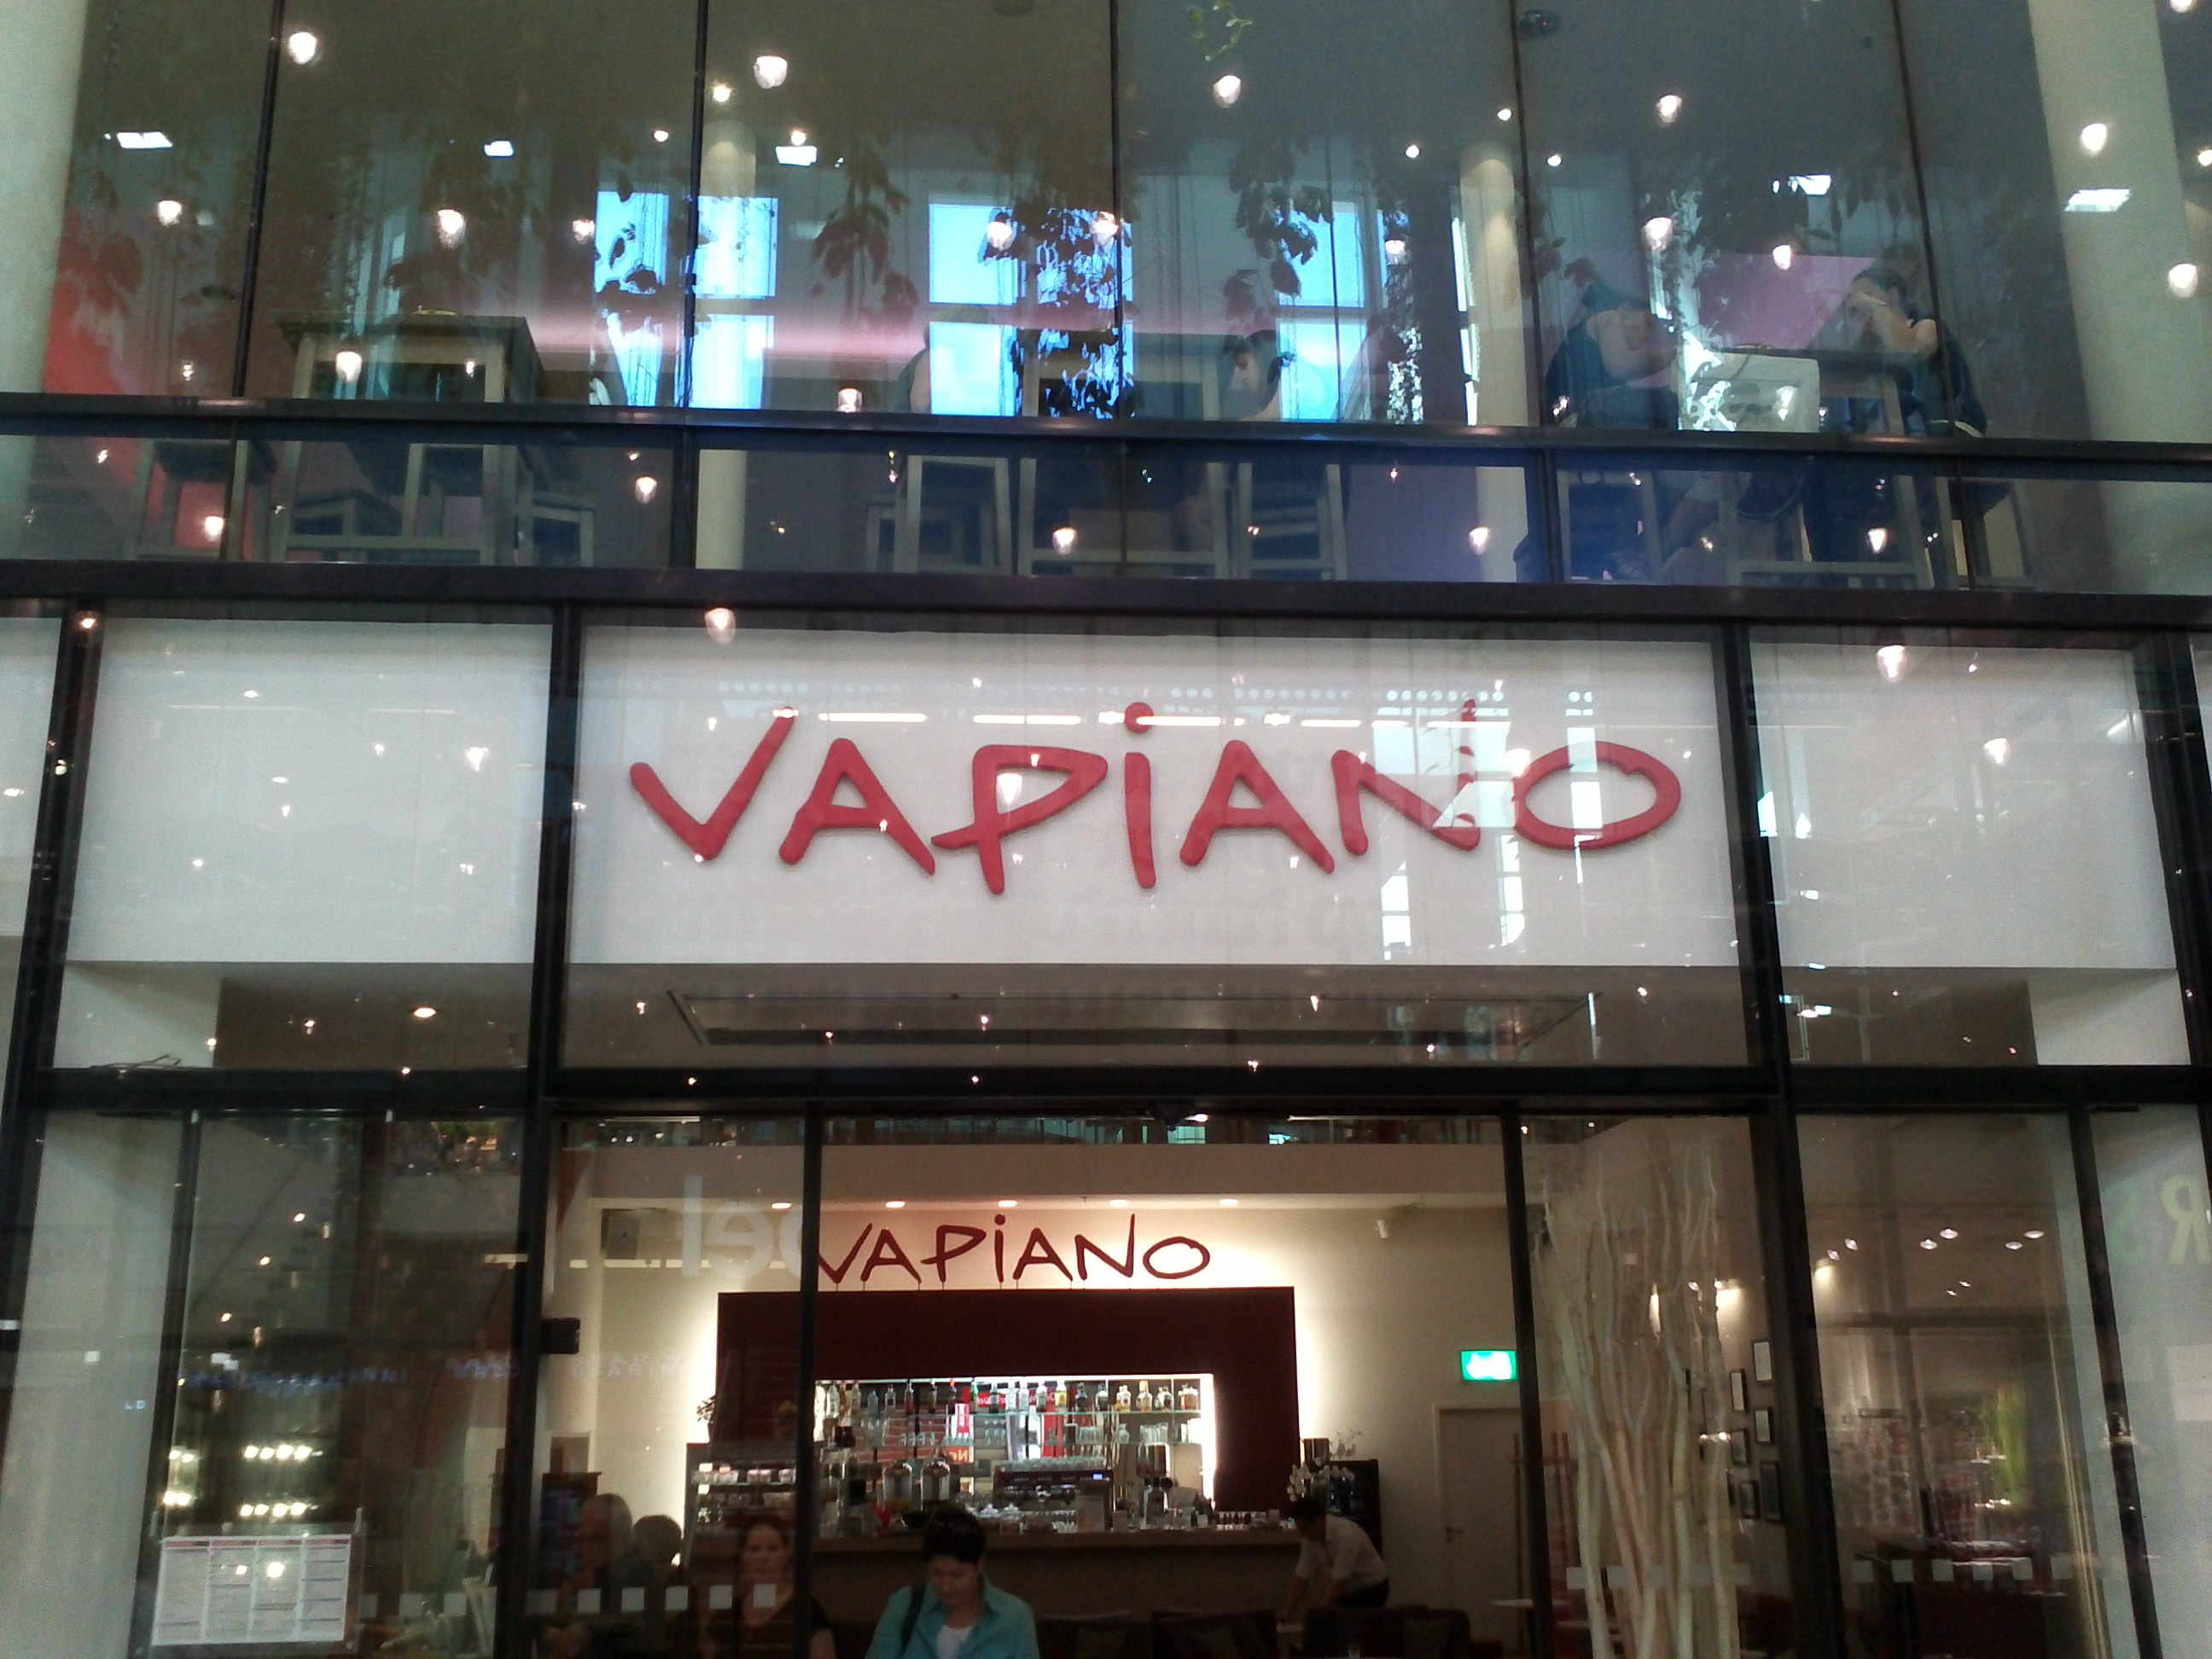 Vapiano Pasta, Pizza und Bar - Restaurant nähe Marienplatz Fünf Höfe ...